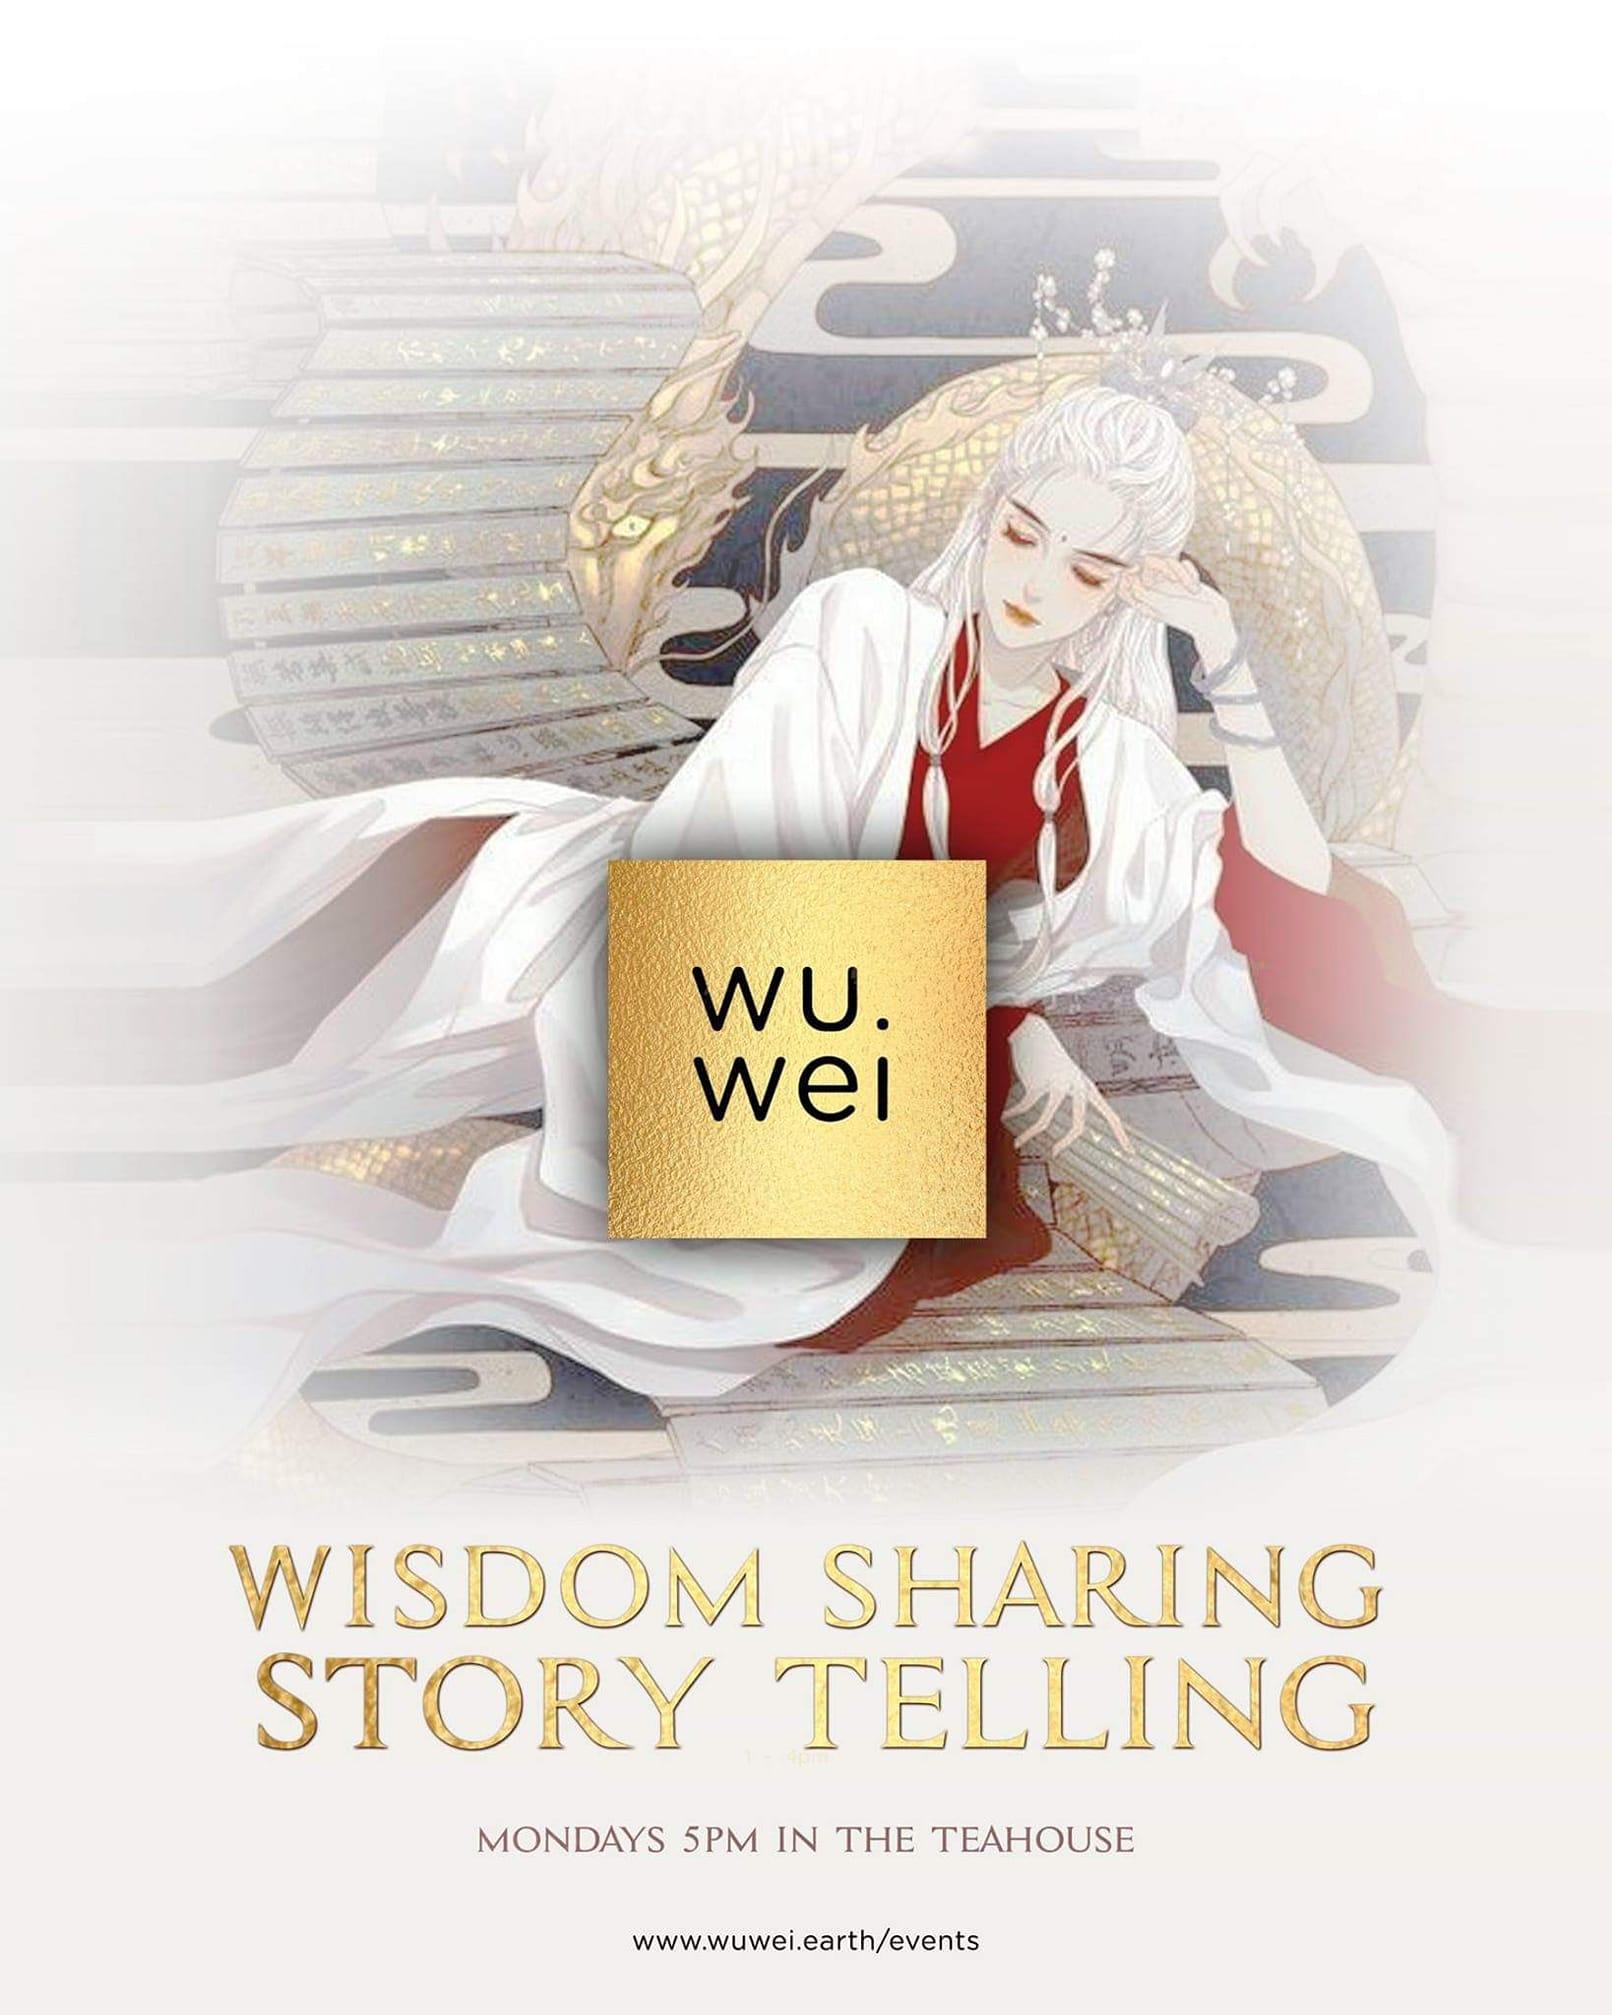 wu_wei_wisdom_sharing_story_telling